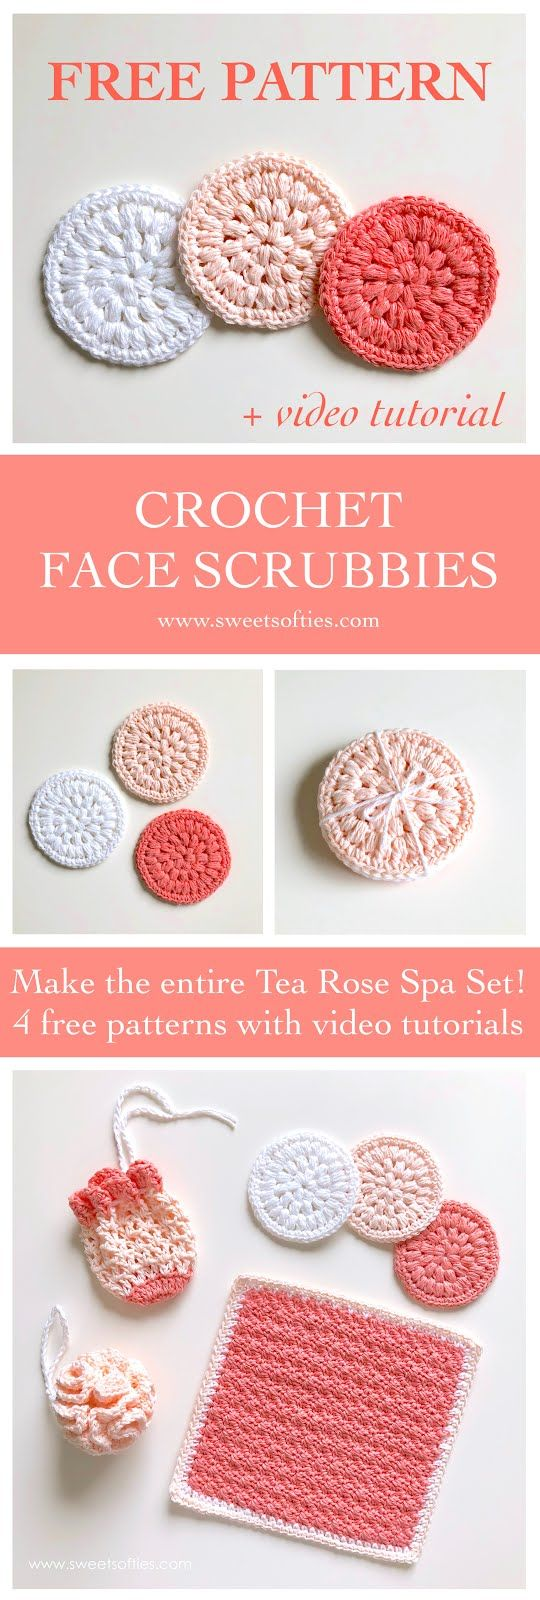 Face Scrubby (Free Crochet Pattern) - Tea Rose Spa Set, Part 1 of 4 #diyyarnholder